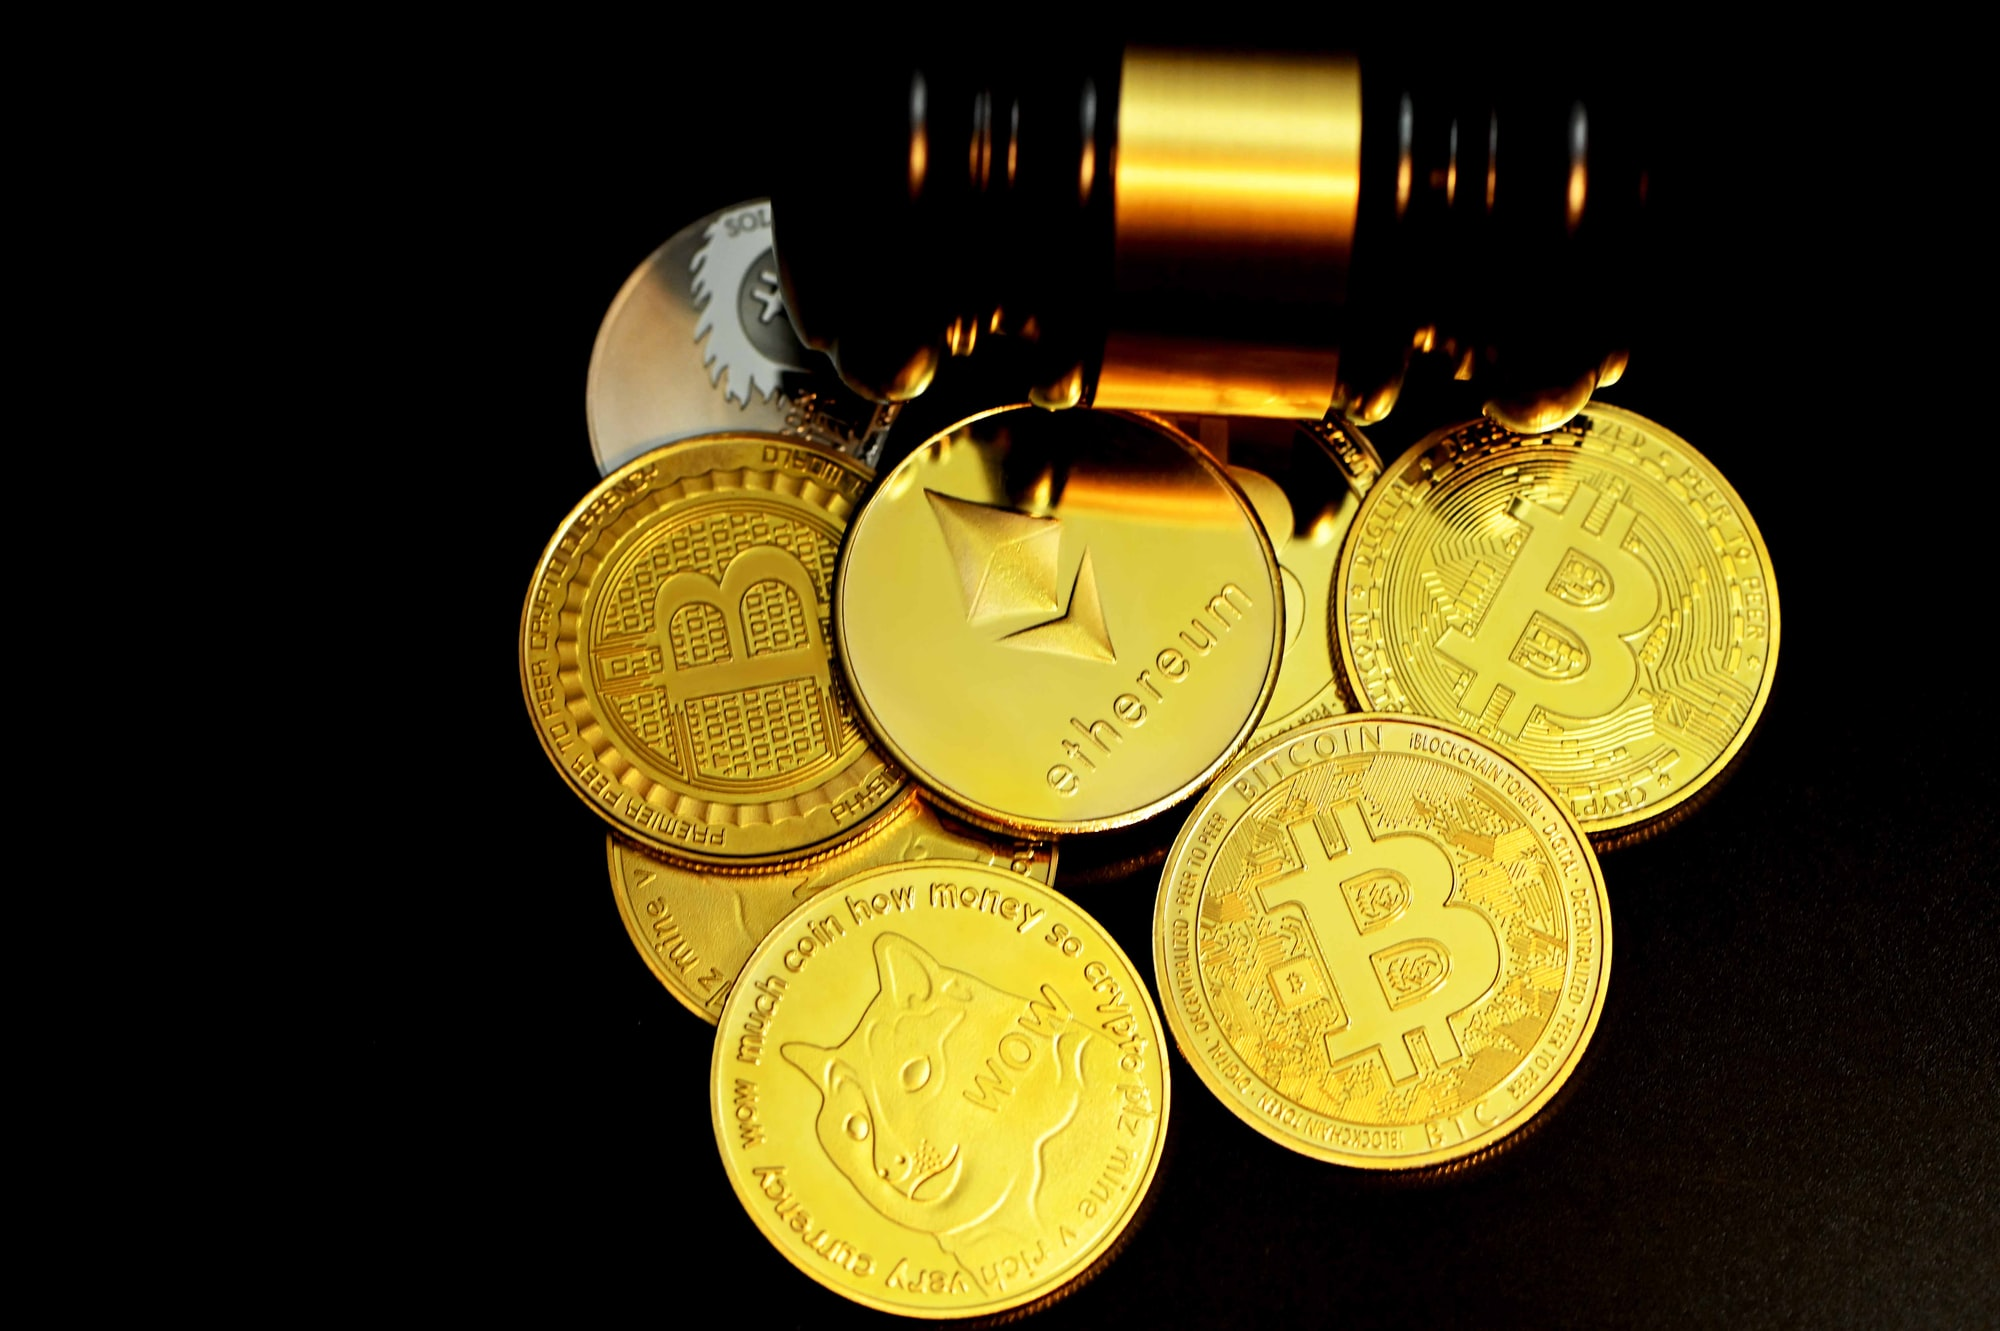 Hacker Finally Returns all of the $600 Million of Stolen Crypto